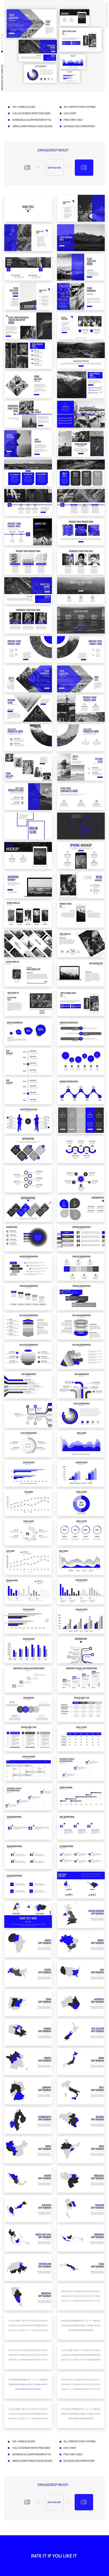 Report Pad Marketing Presentation Template  Marketing